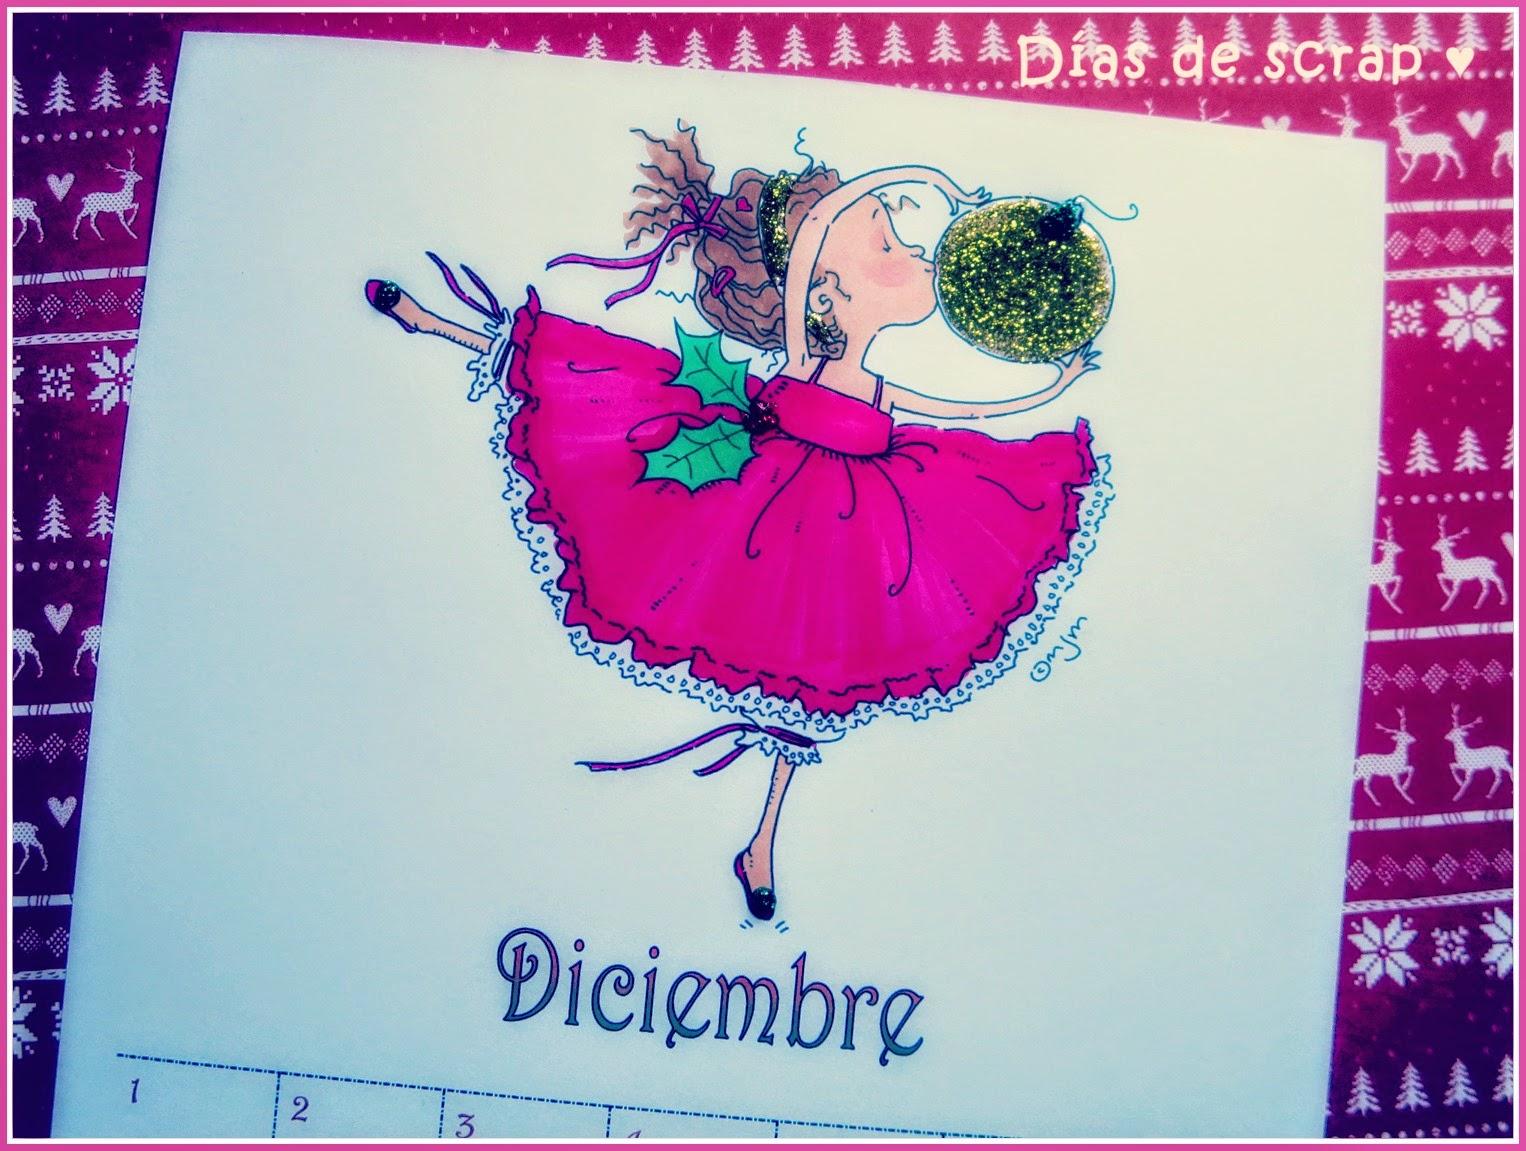 scrap calendario diciembre mo's digital pencil